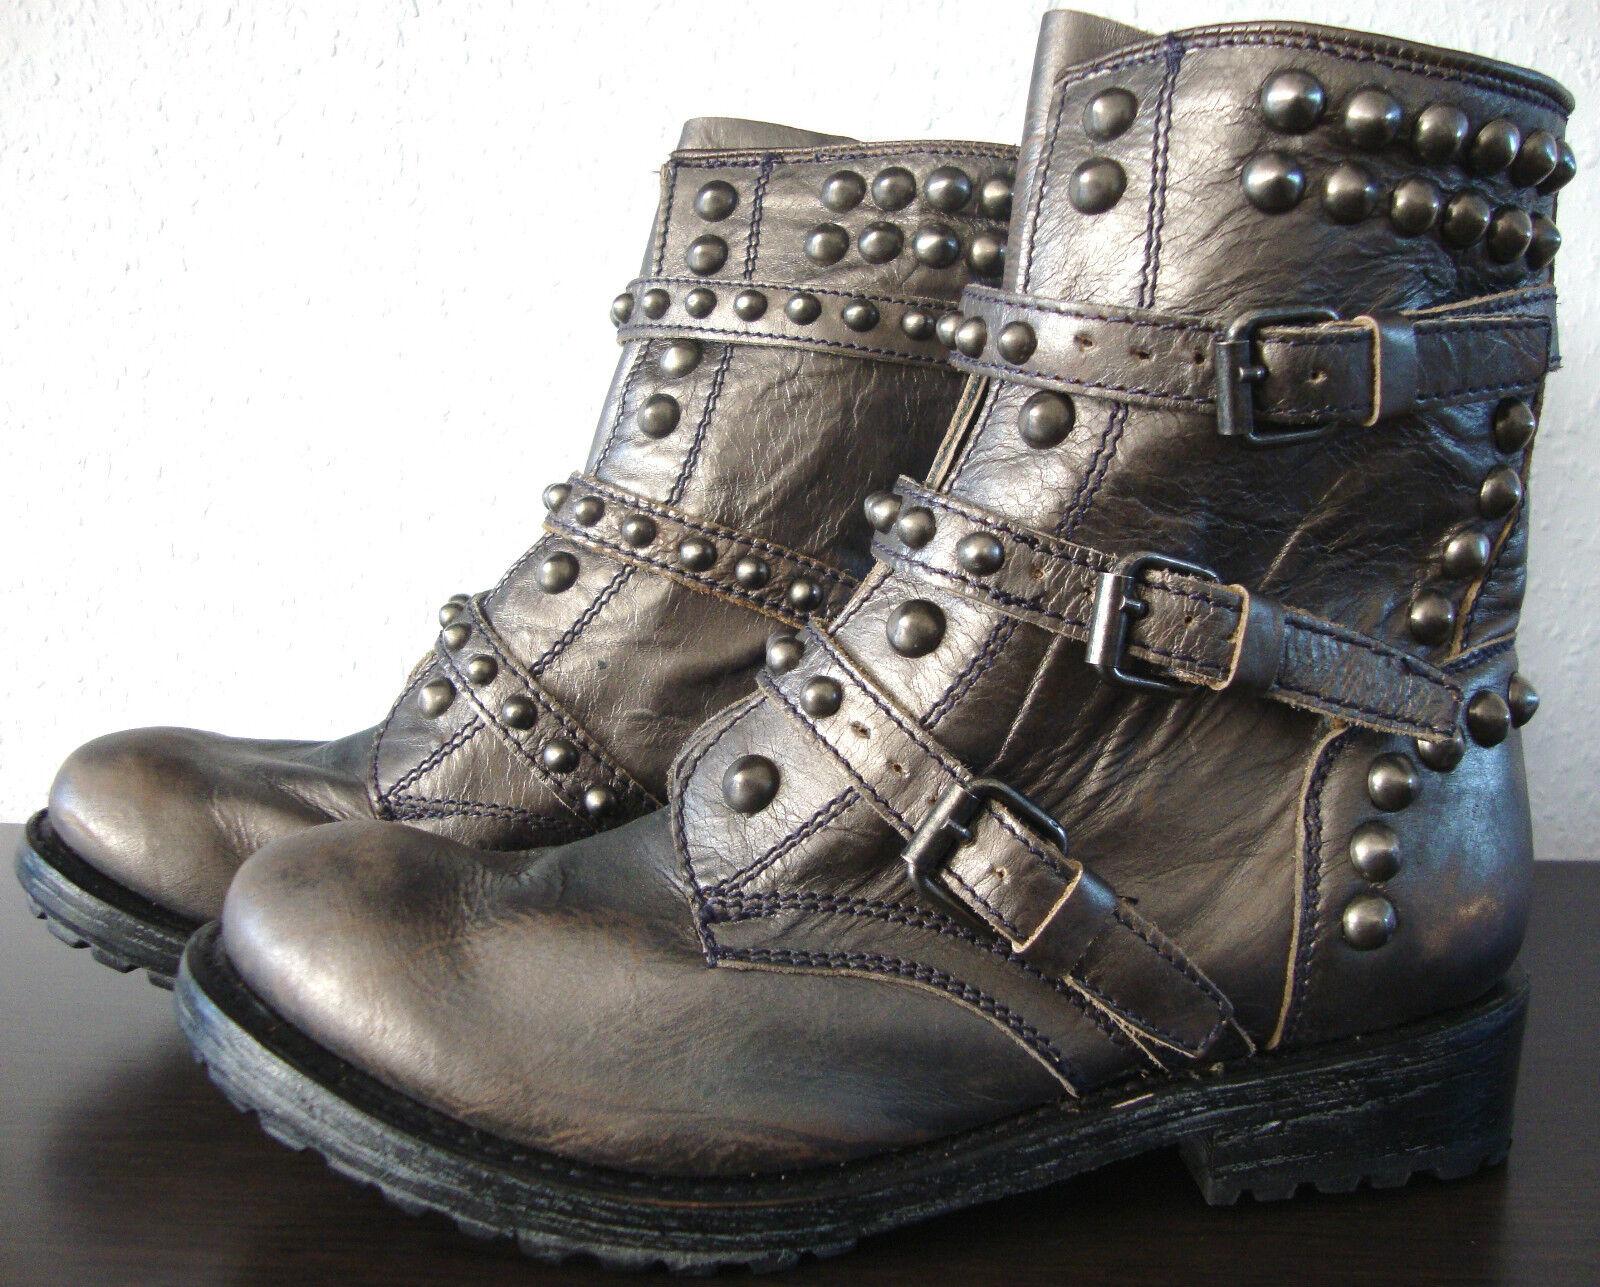 ASH Damen REESE Biker Stiefel Damen ASH Stiefelette Stiefel Leder Schuhe Nieten Gr.39 NEU 78ac6e